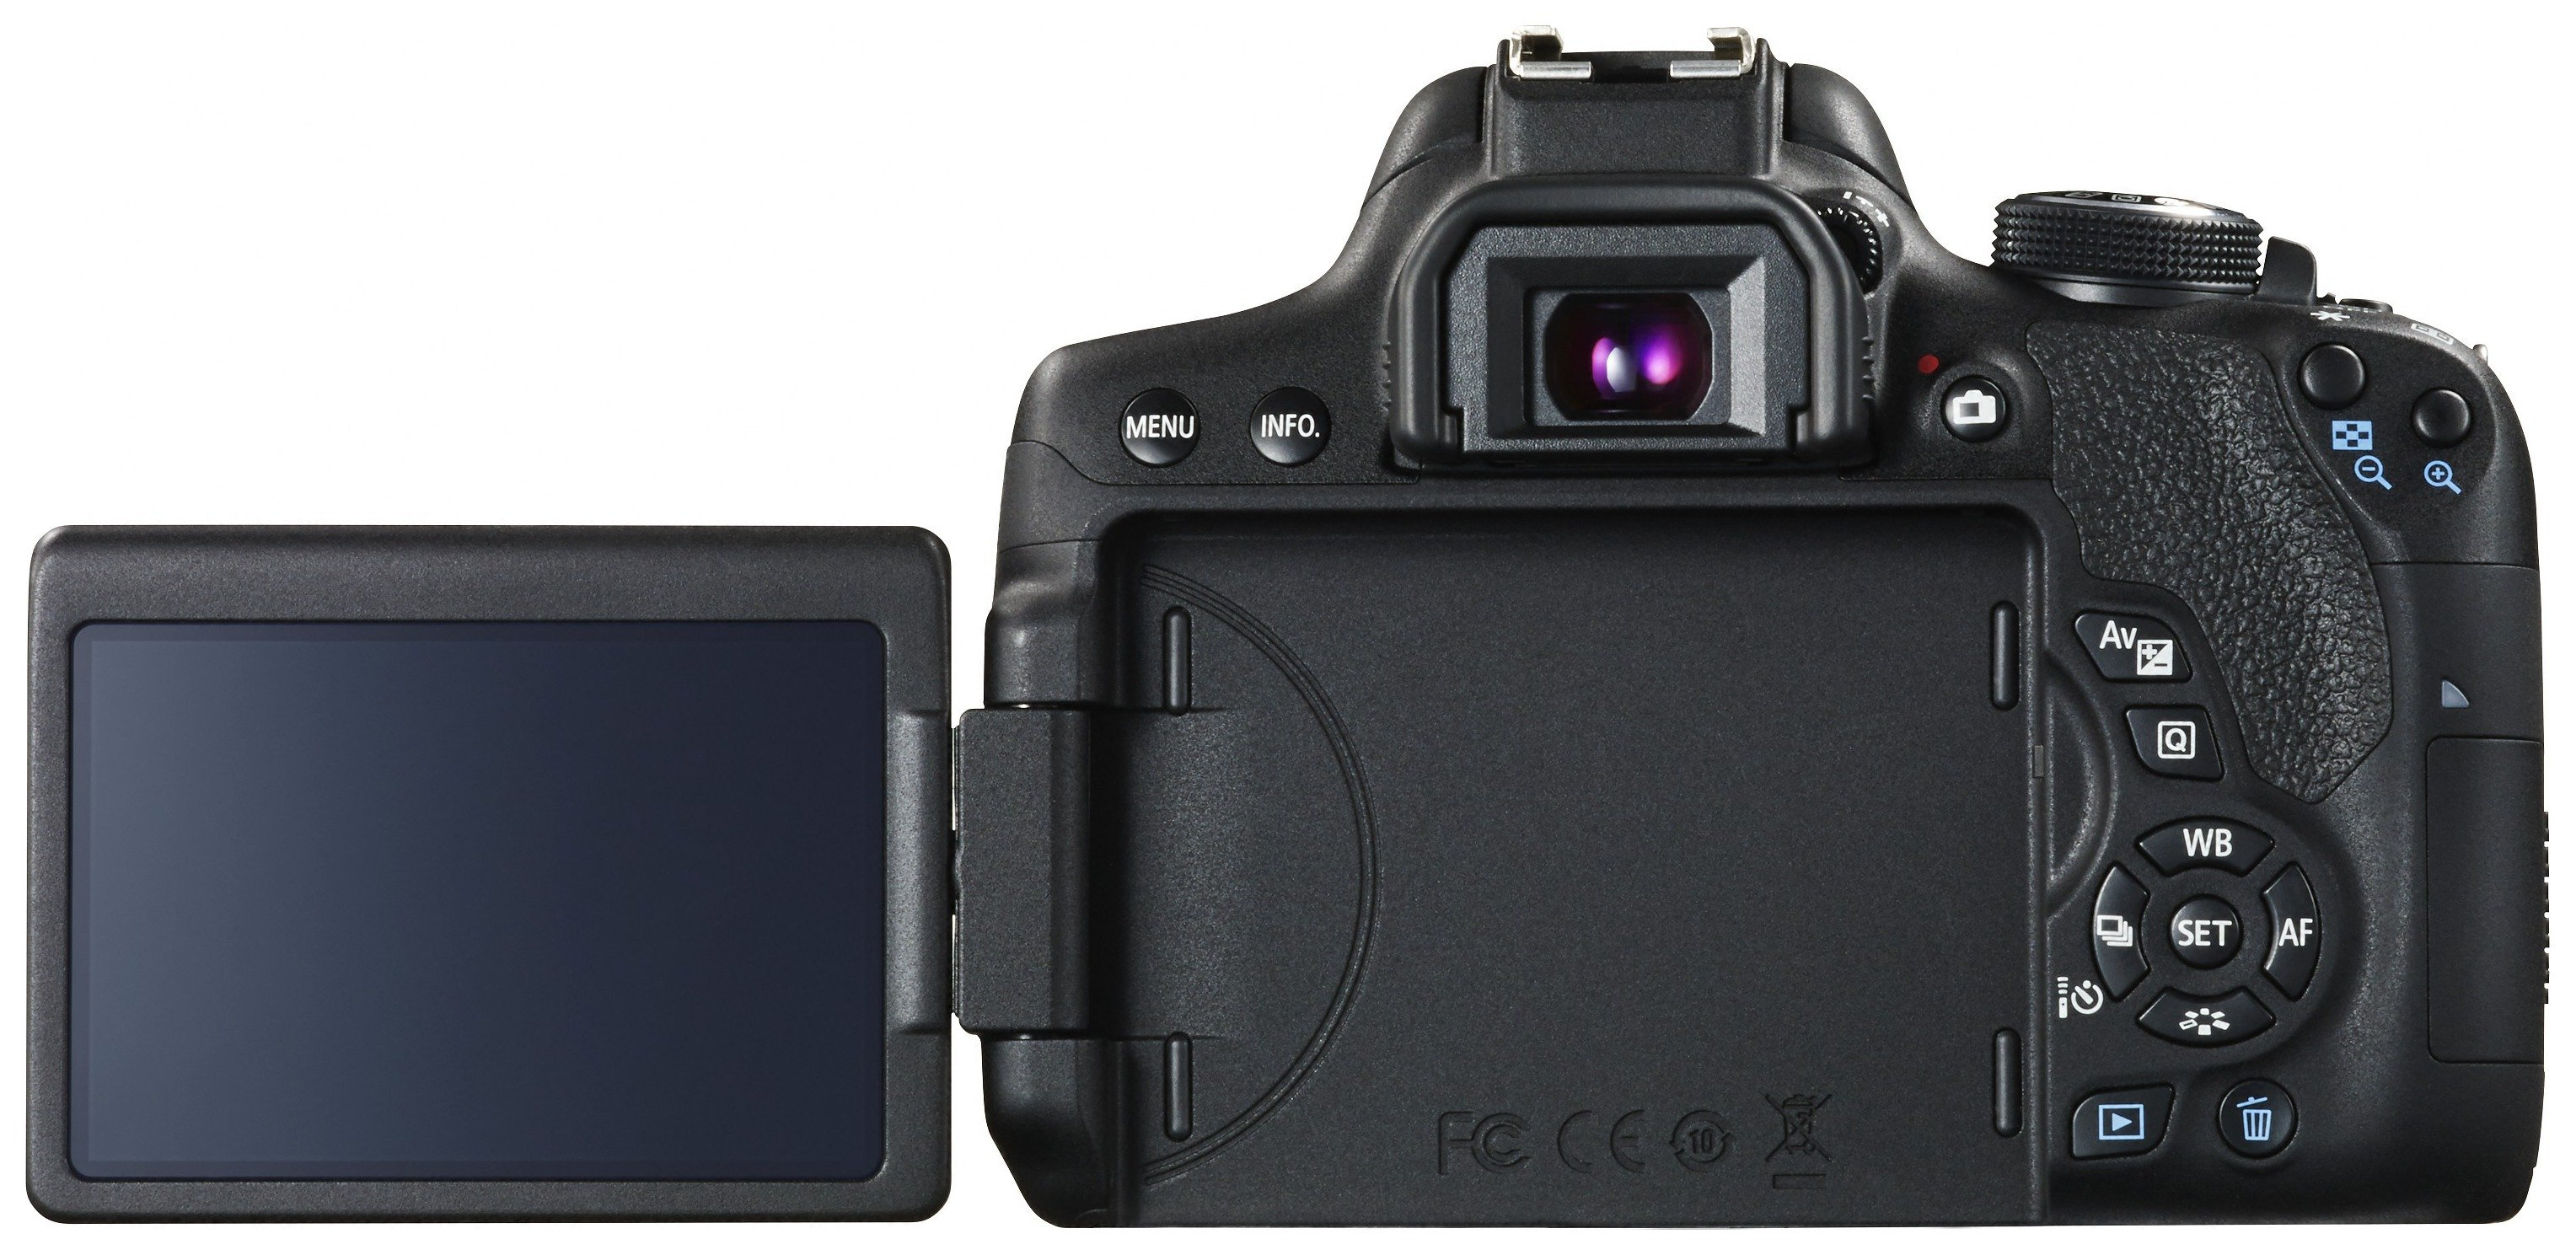 Camera Buy Dslr Camera Uk buy canon eos 750d dslr camera with 18 55mm lens at argos co uk lens4256733